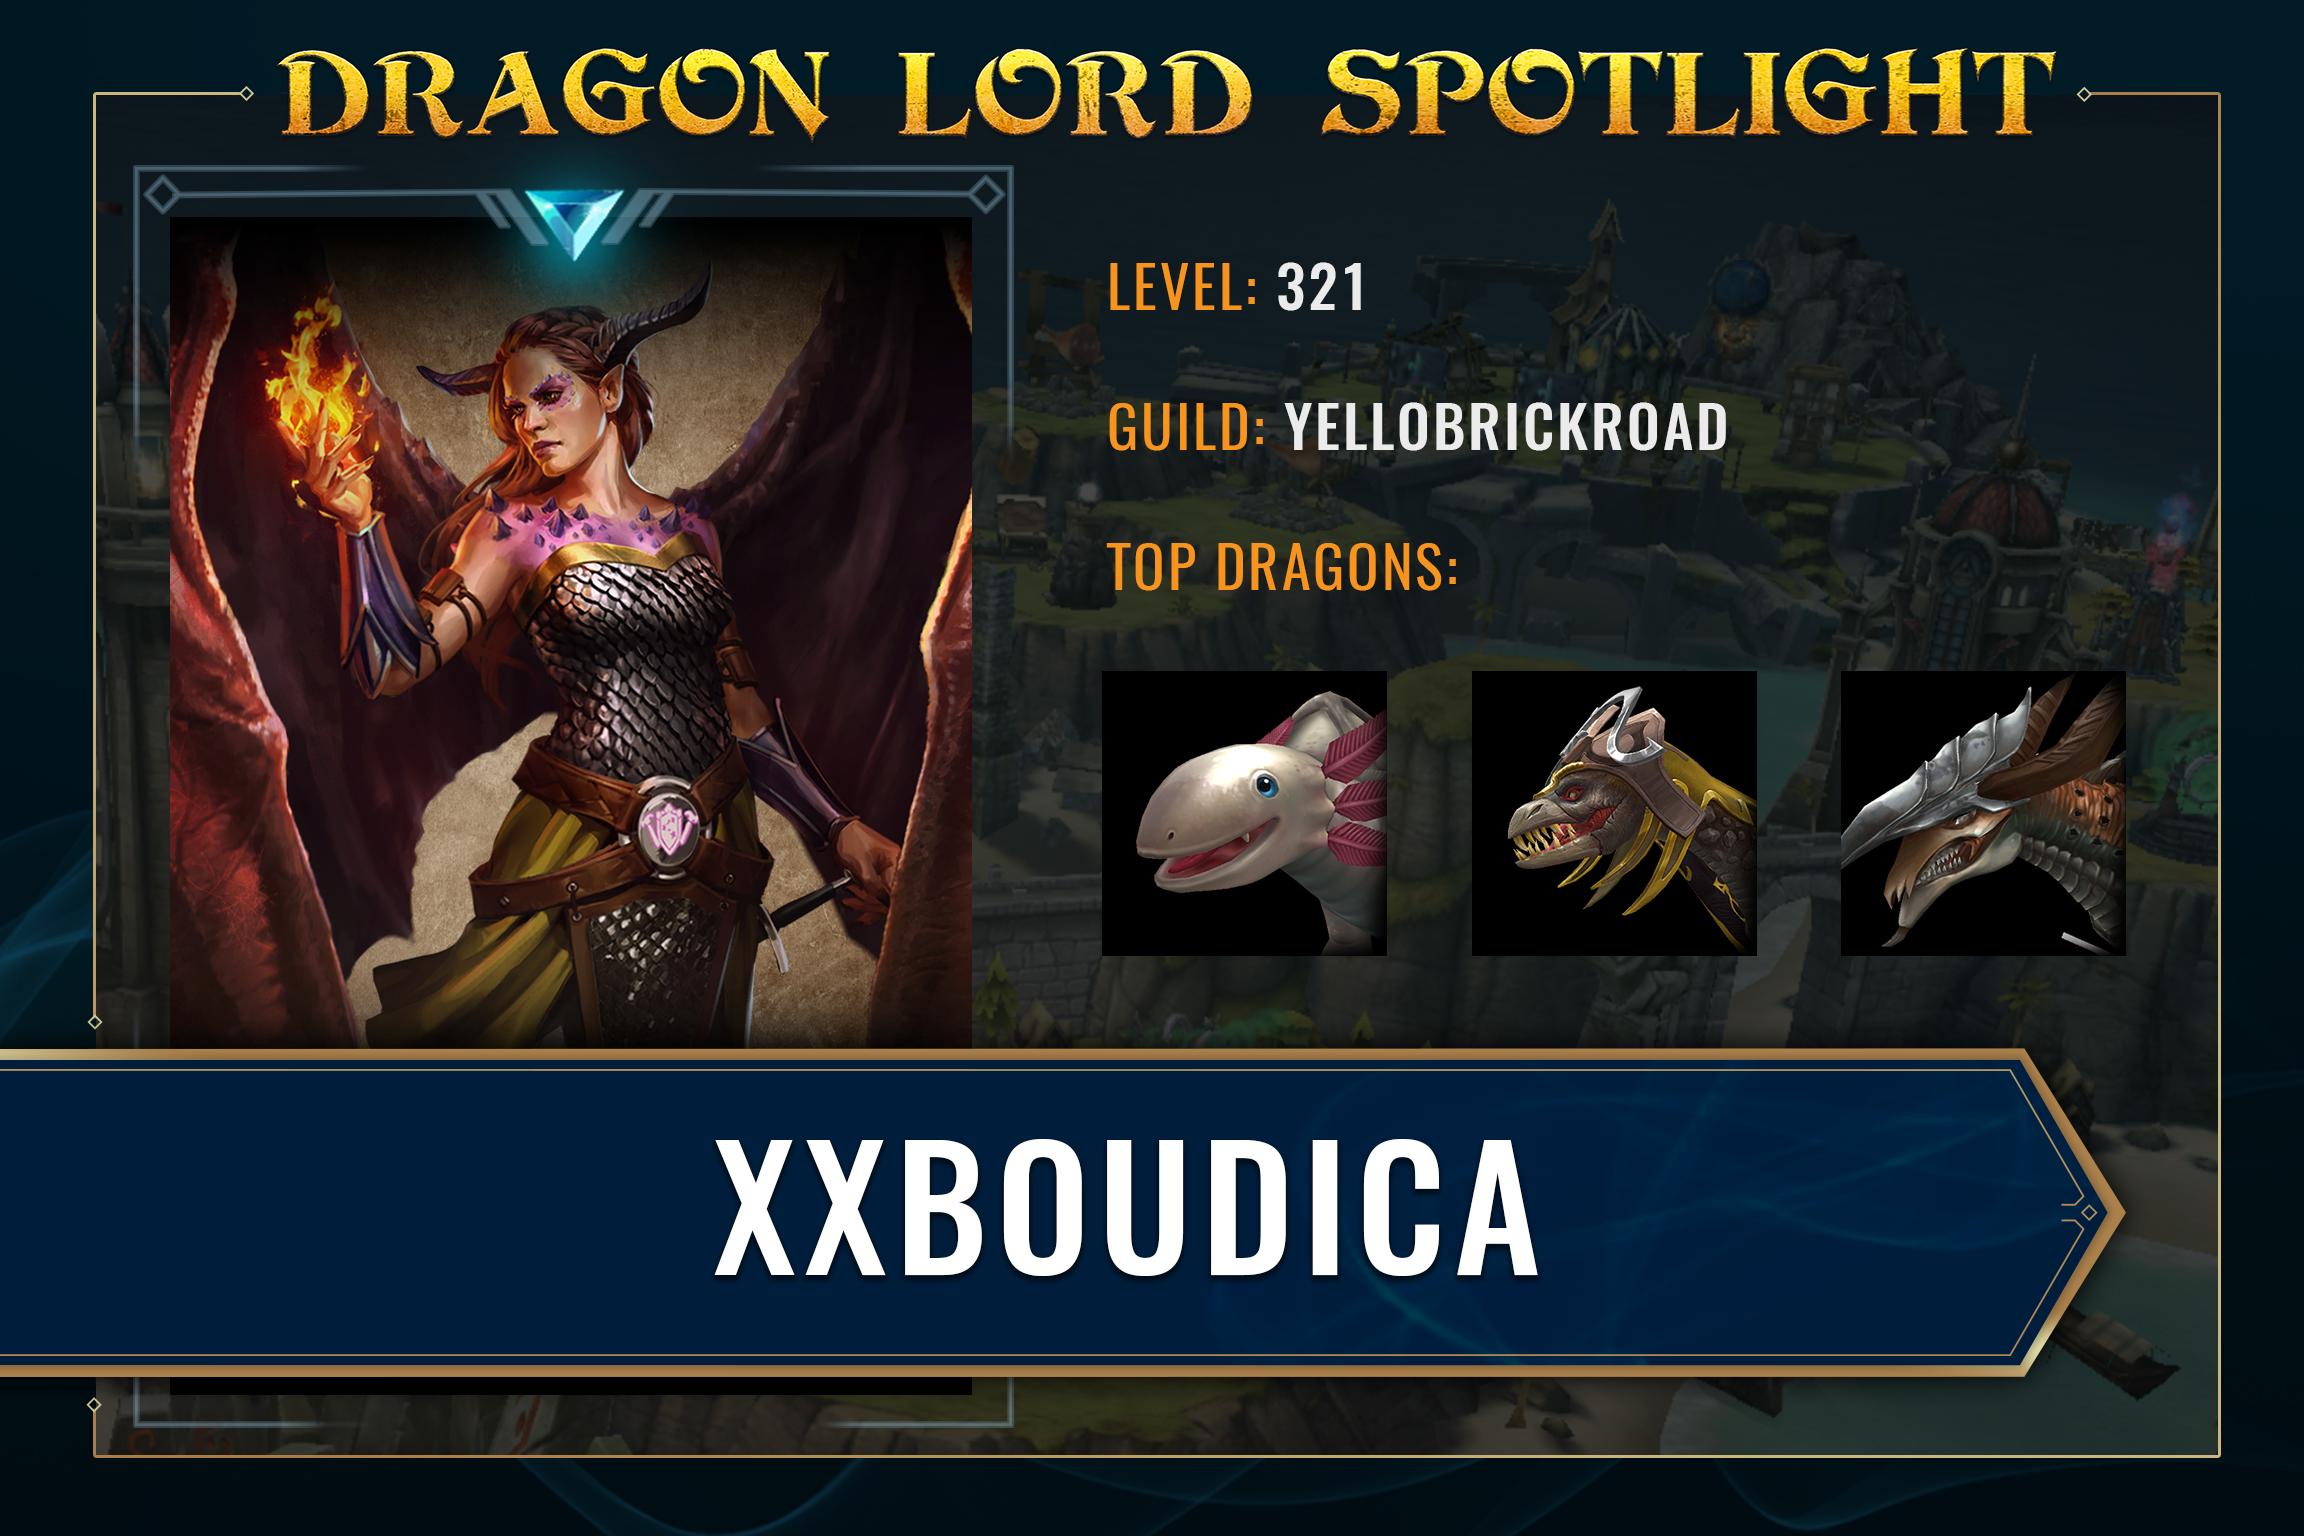 War Dragons - xxBoudica